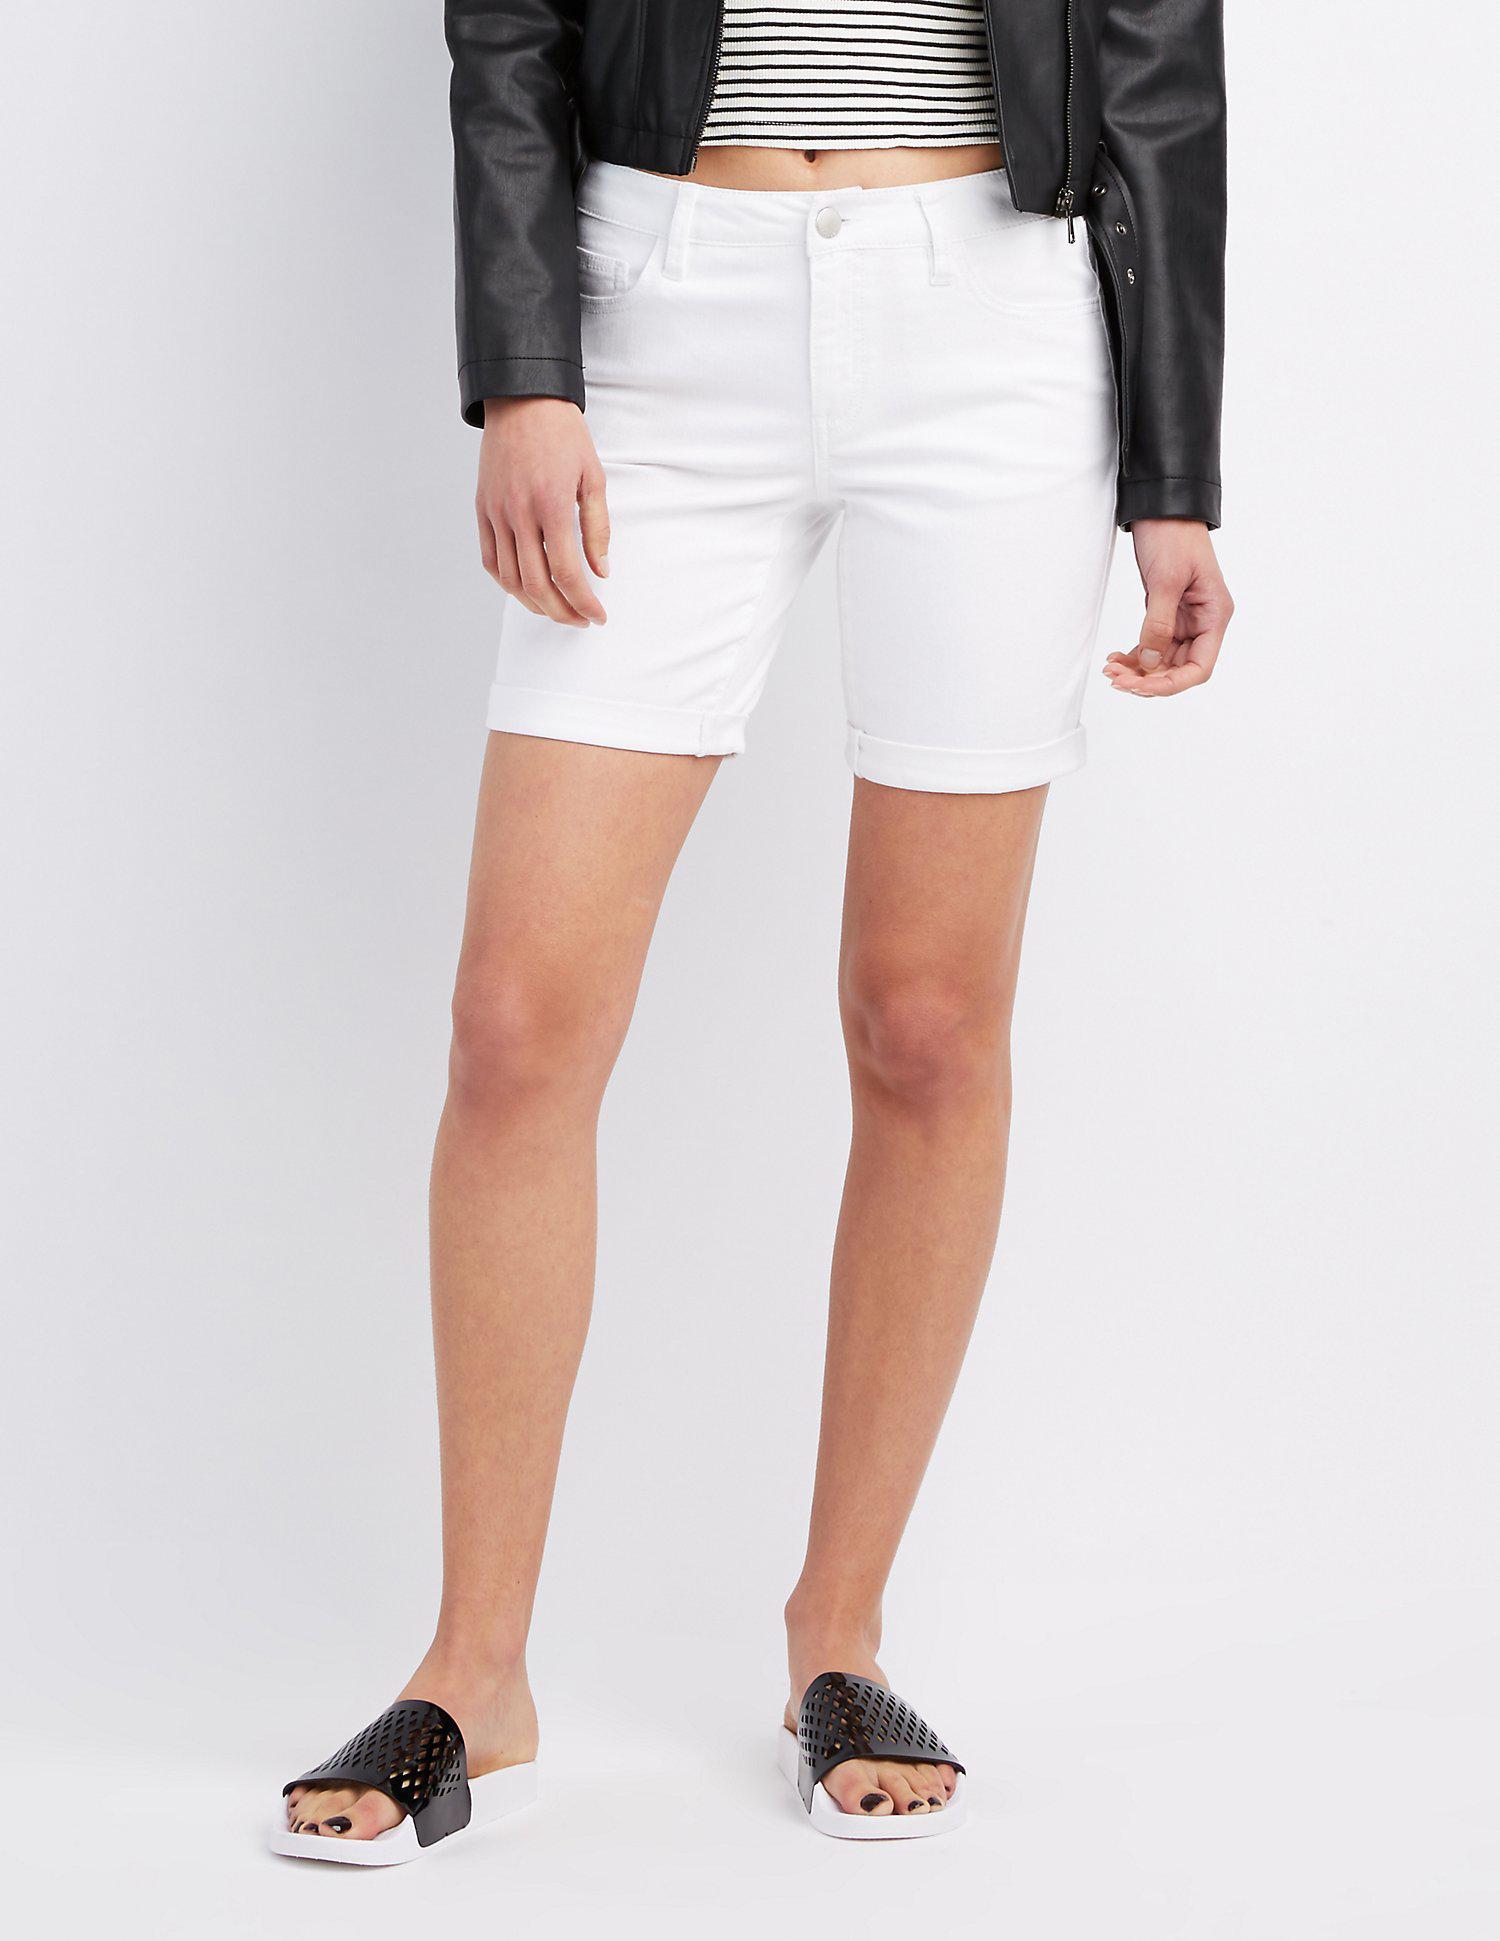 59cfd797dc Lyst - Charlotte Russe Refuge Denim Bermuda Shorts in White